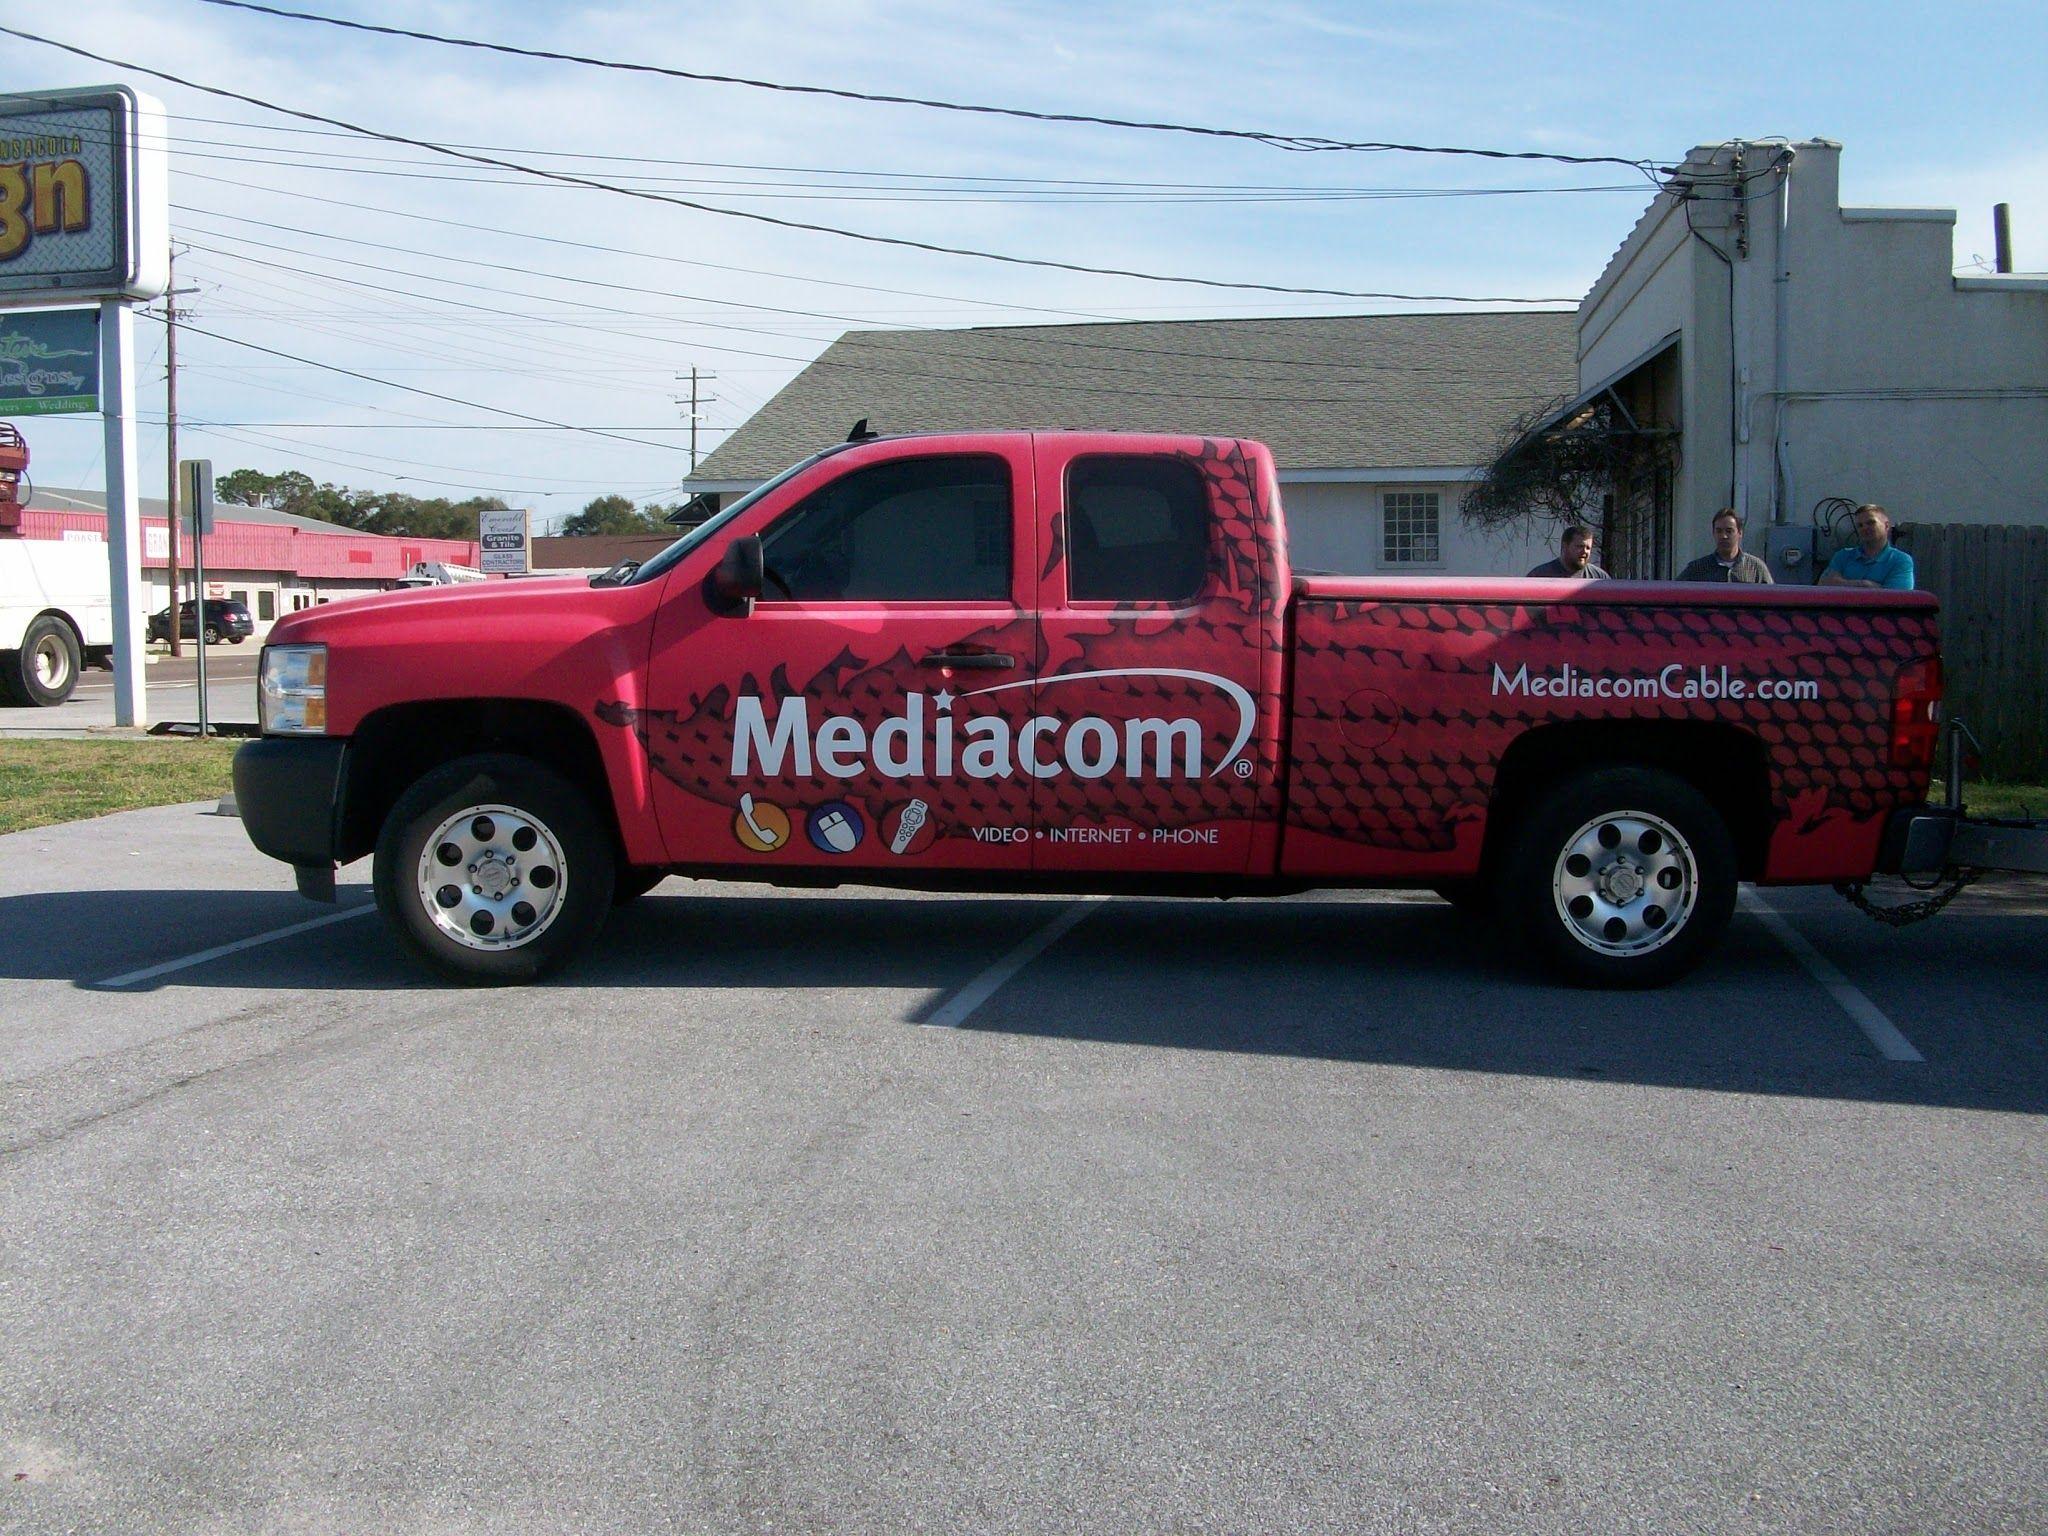 Mediacom Threatens 'Excessive Uploaders'